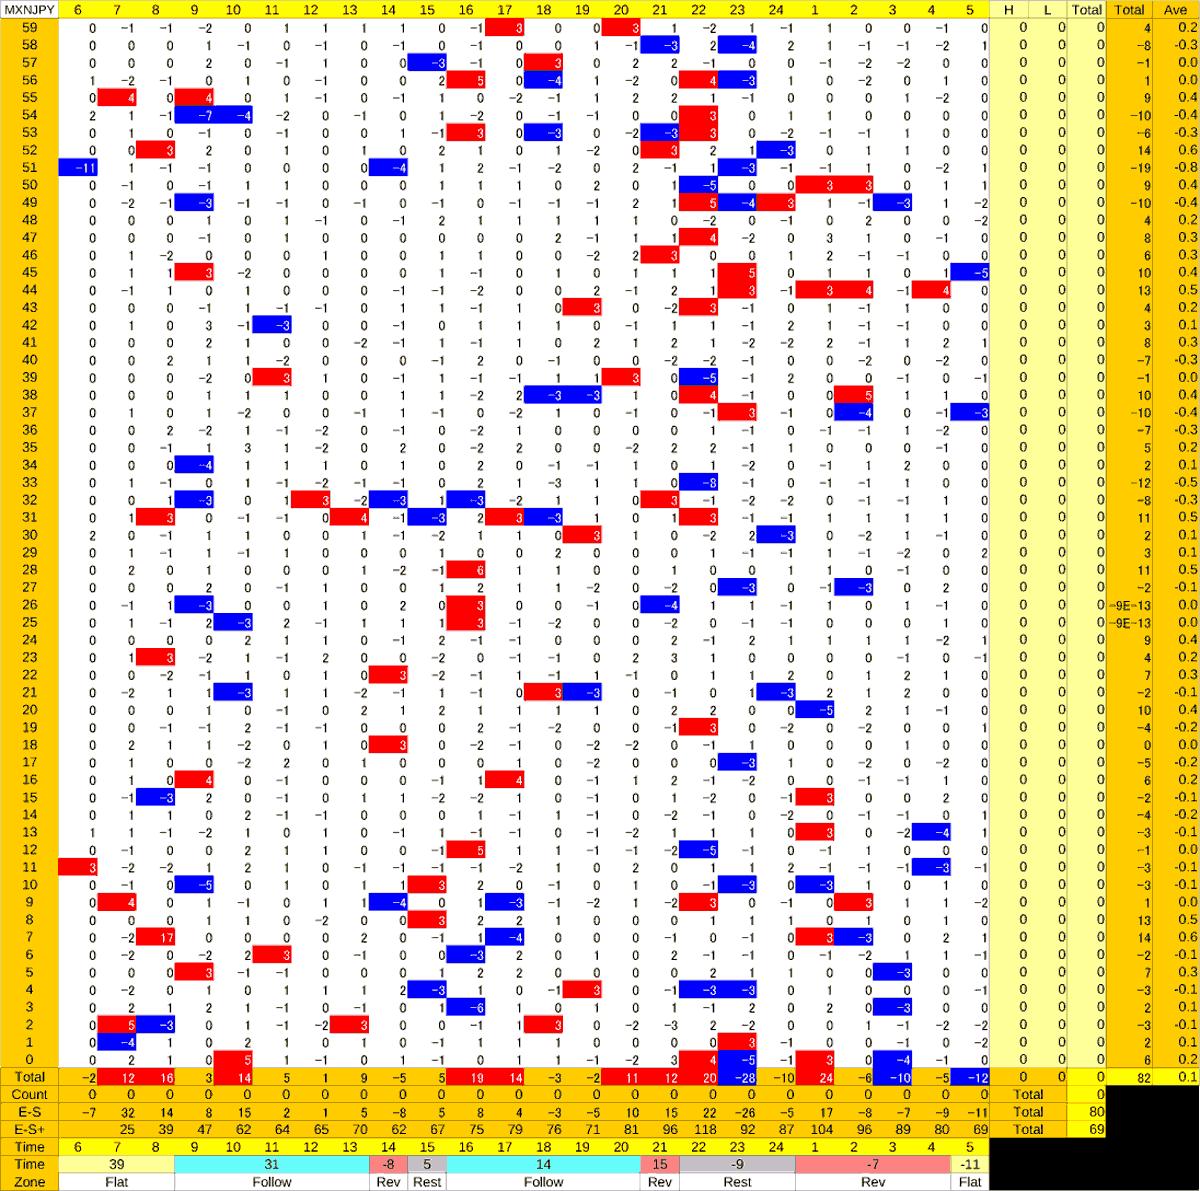 20200622_HS(3)MXNJPY